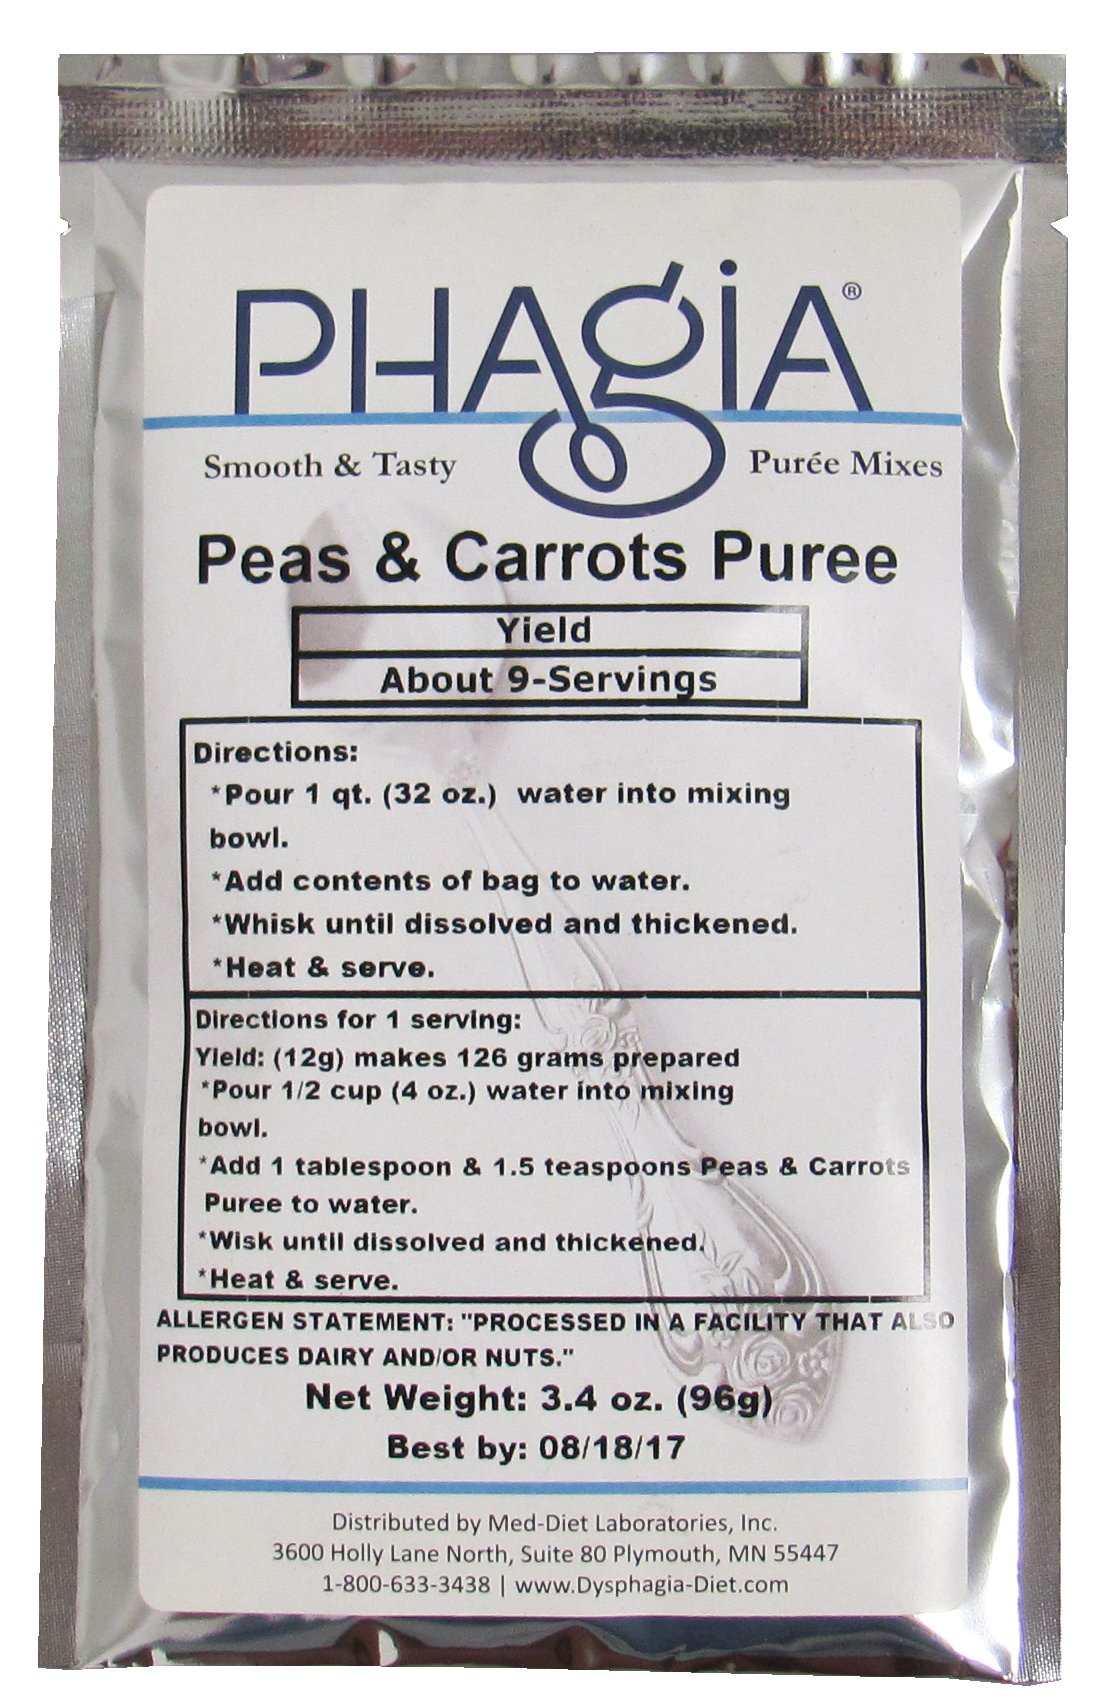 Phagia Pureed Peas & Carrot 6/3.4 oz. Bags